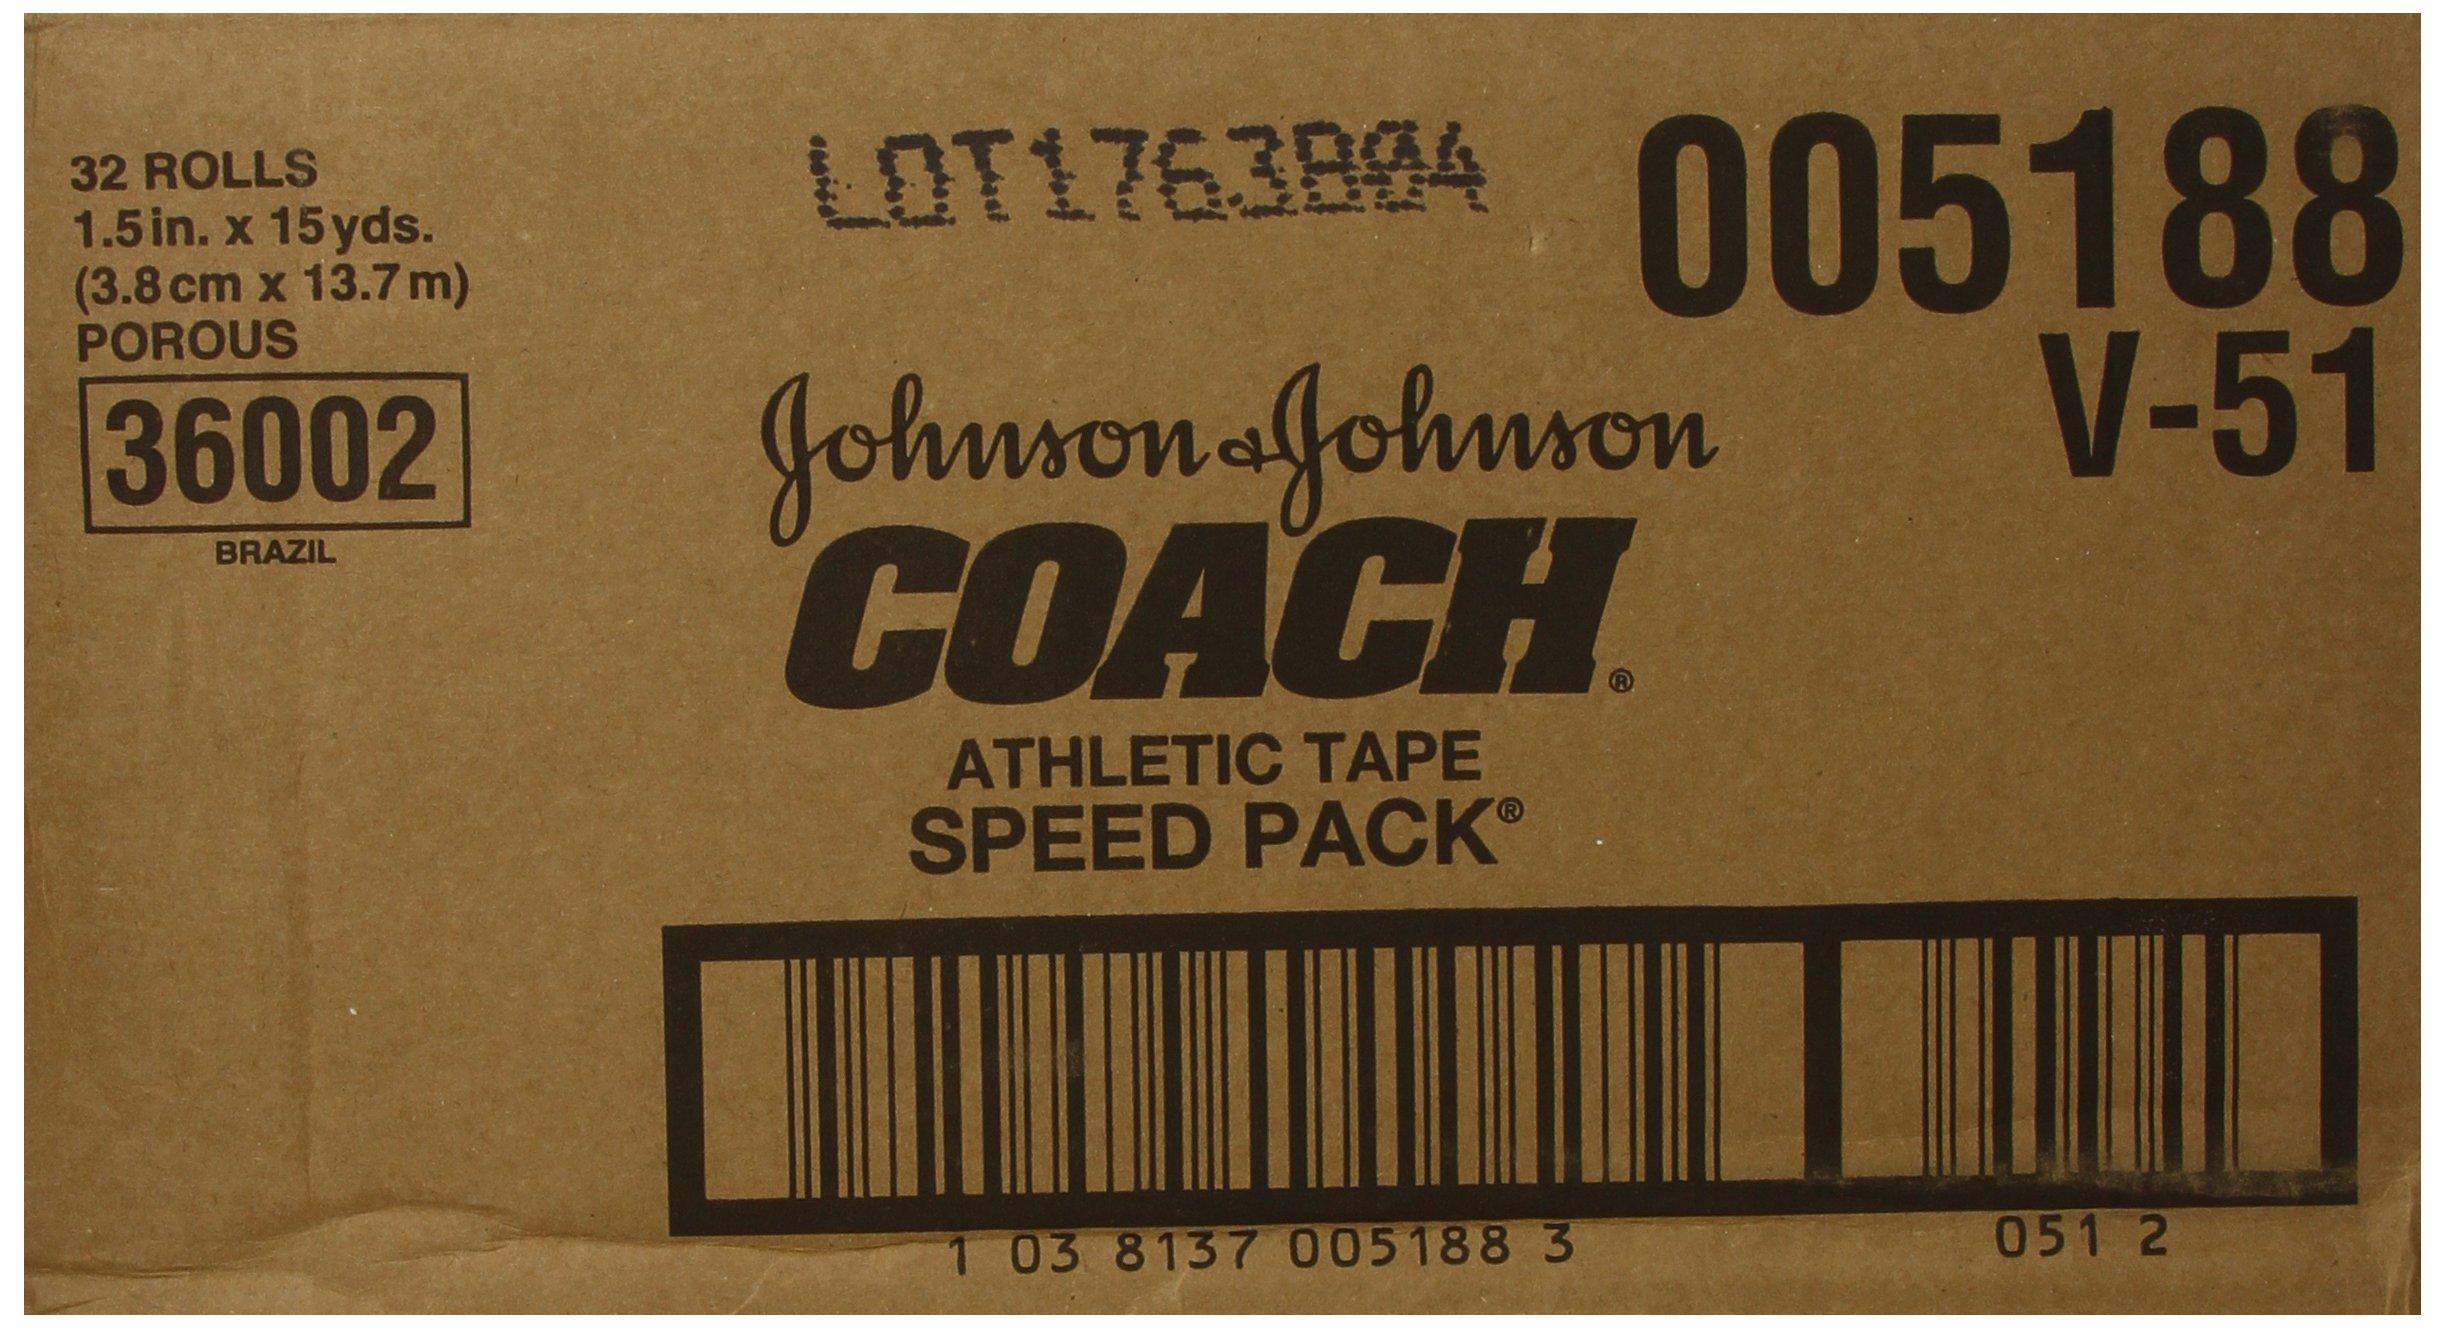 Johnson & Johnson Consumer Coach Porous Athletic Tape, 32 Count